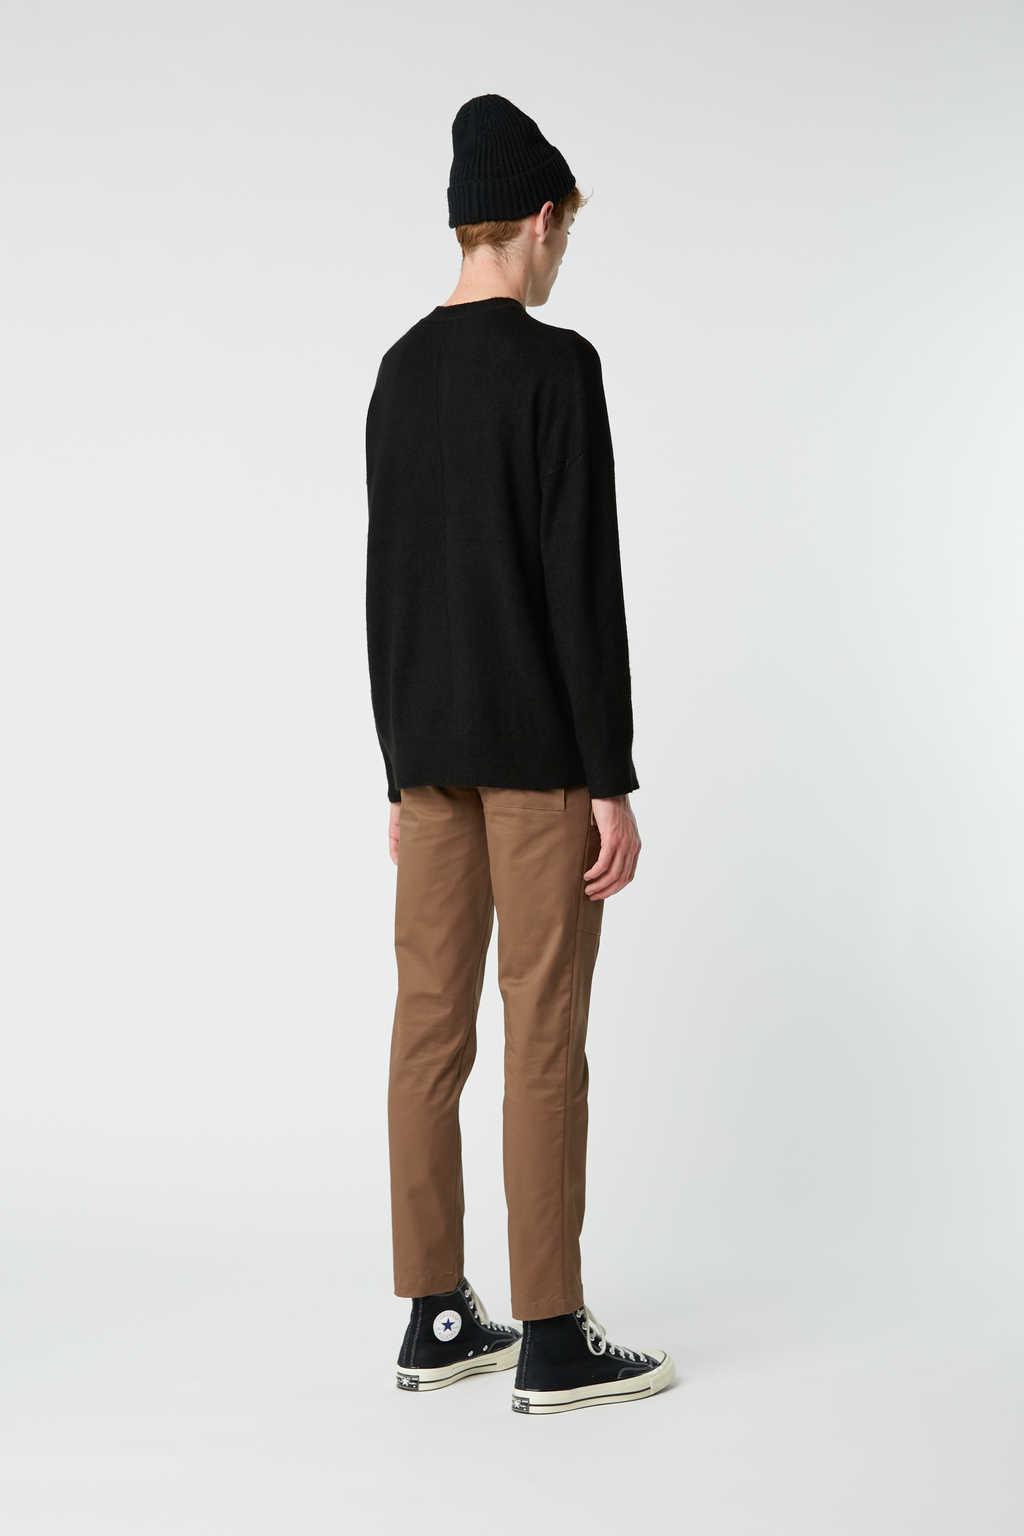 Sweater 2482 Black 16